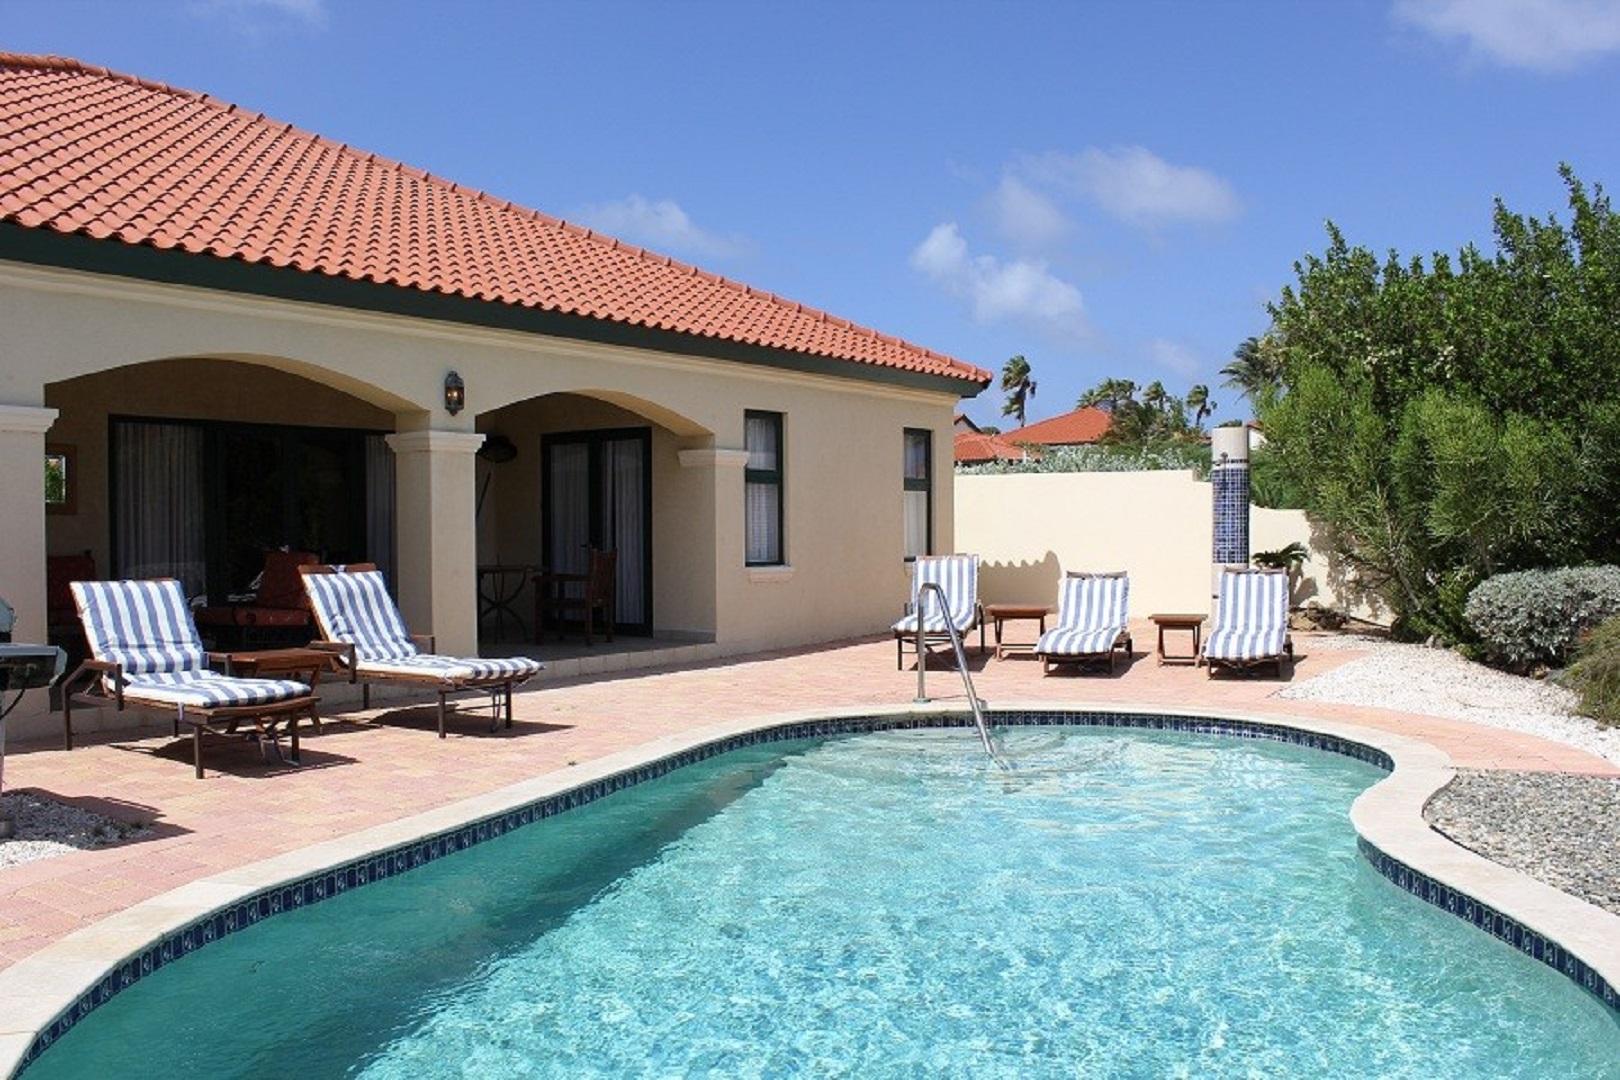 A Villa Paradiso, located on Tierra del Sol photo 27925761